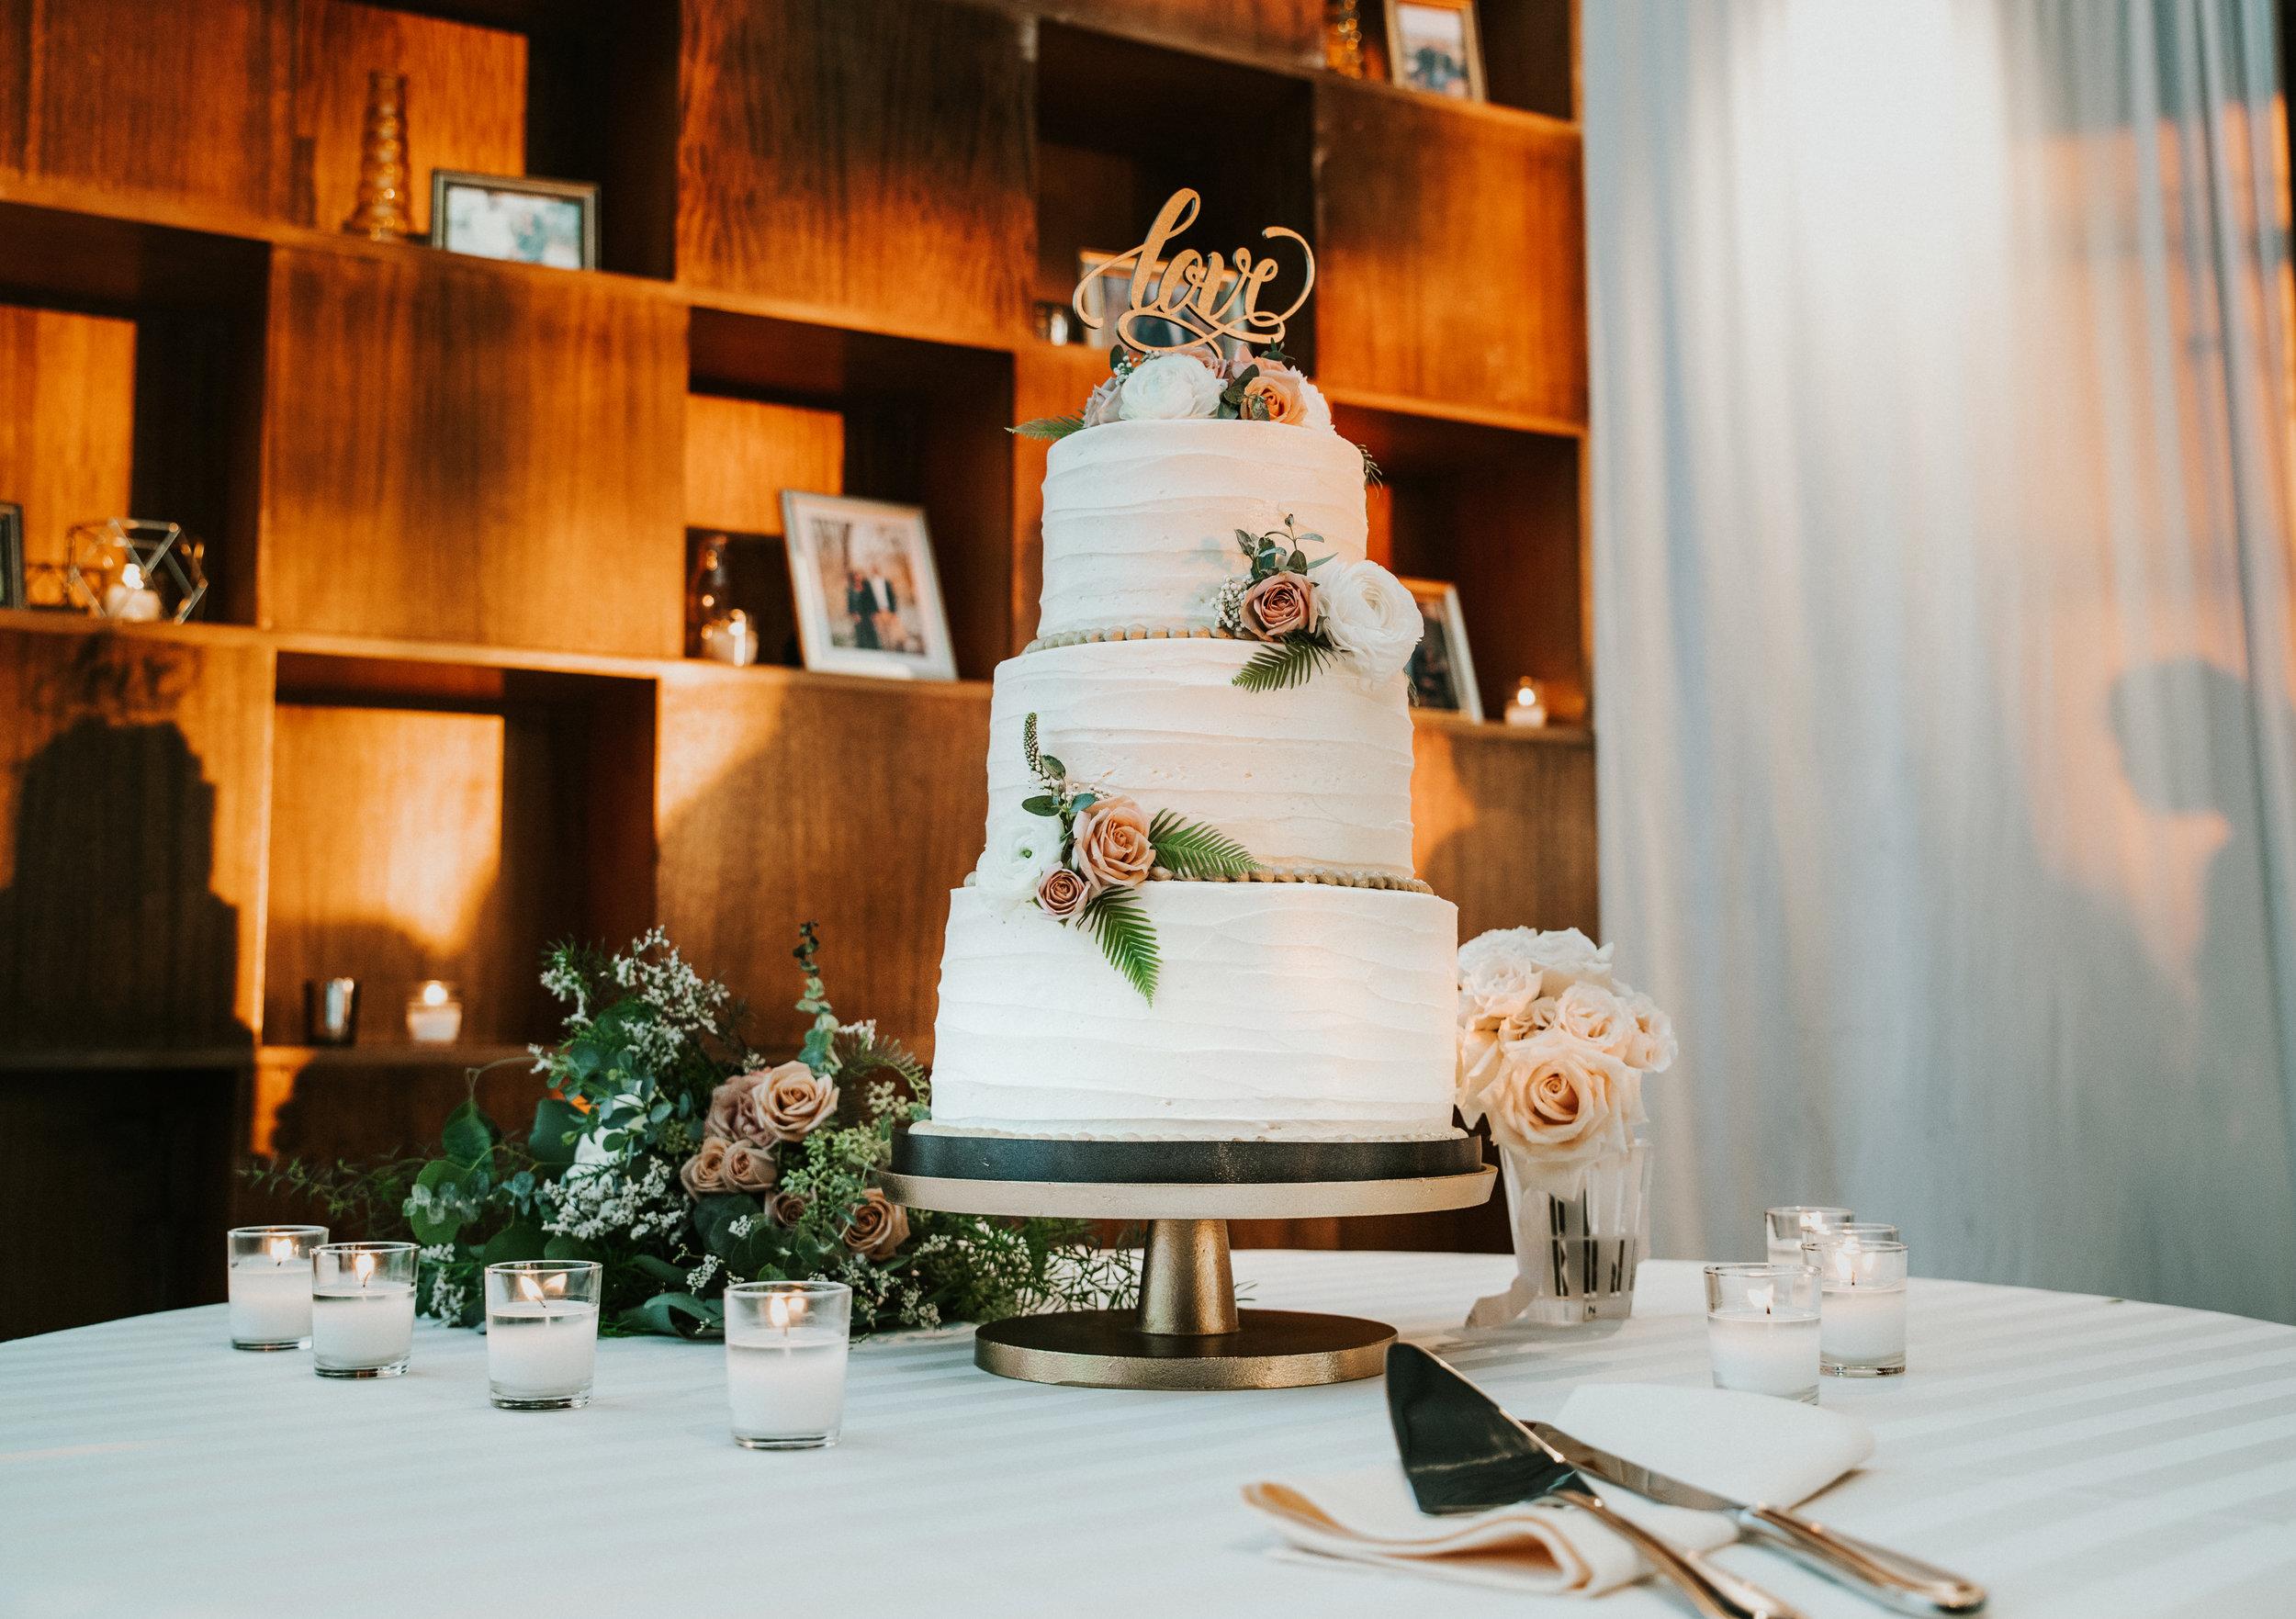 The Lofts at Union Square, High Point, NC. Wedding Reception Photos, Wedding Cake Photos. North Carolina Wedding Photographer, Marina Rey Photography.